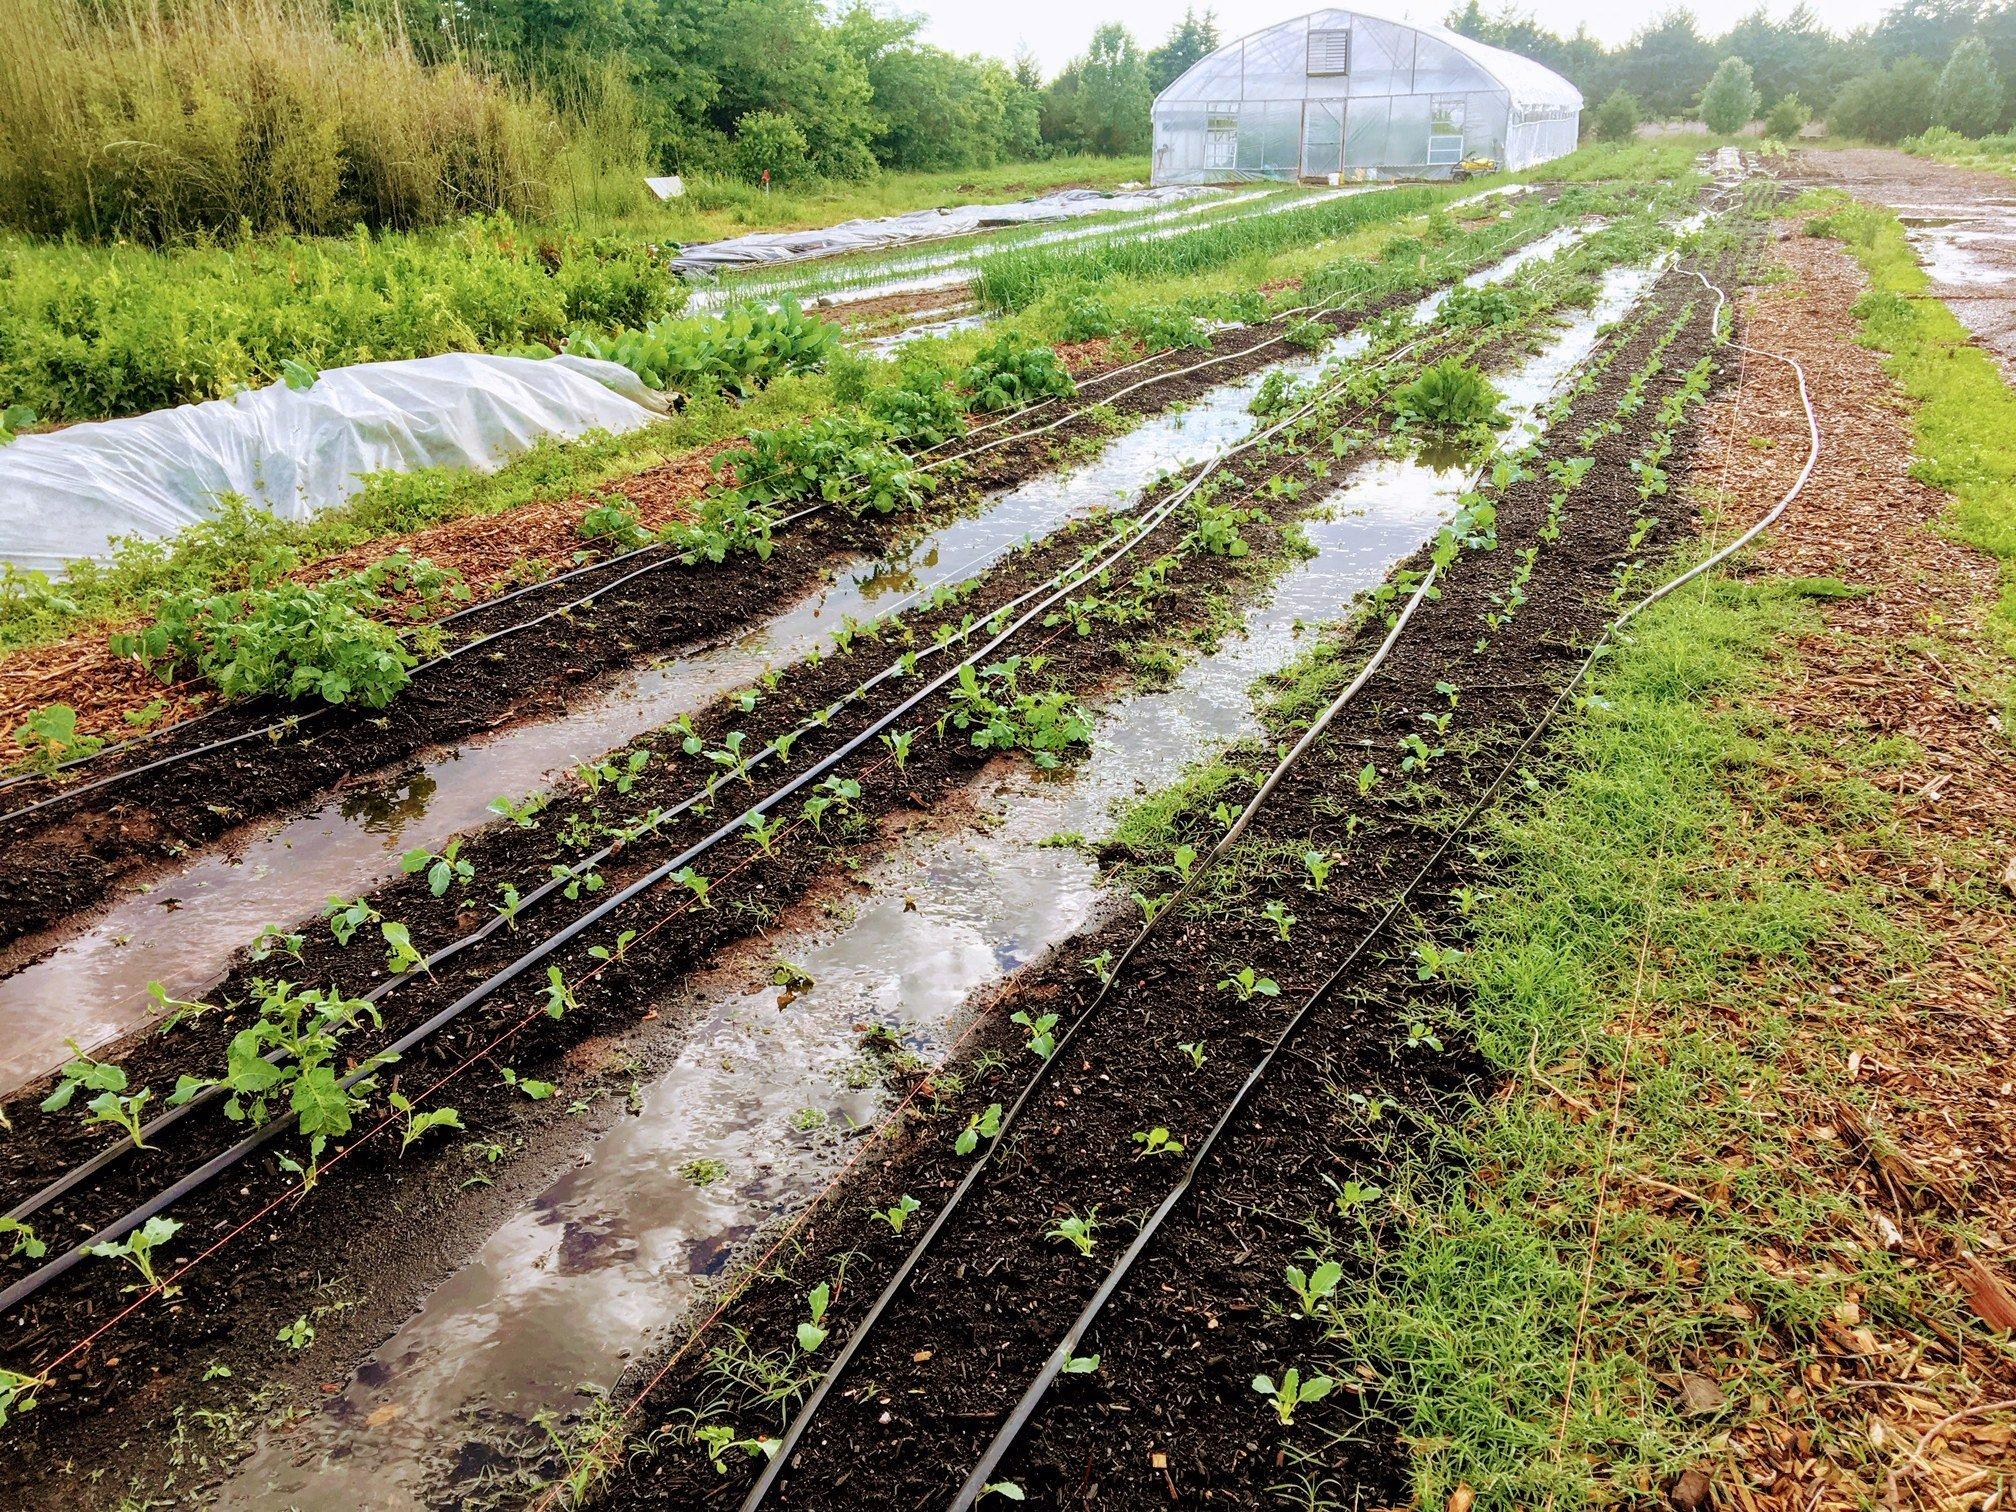 Next Happening: Farm Happenings for June 1, 2019